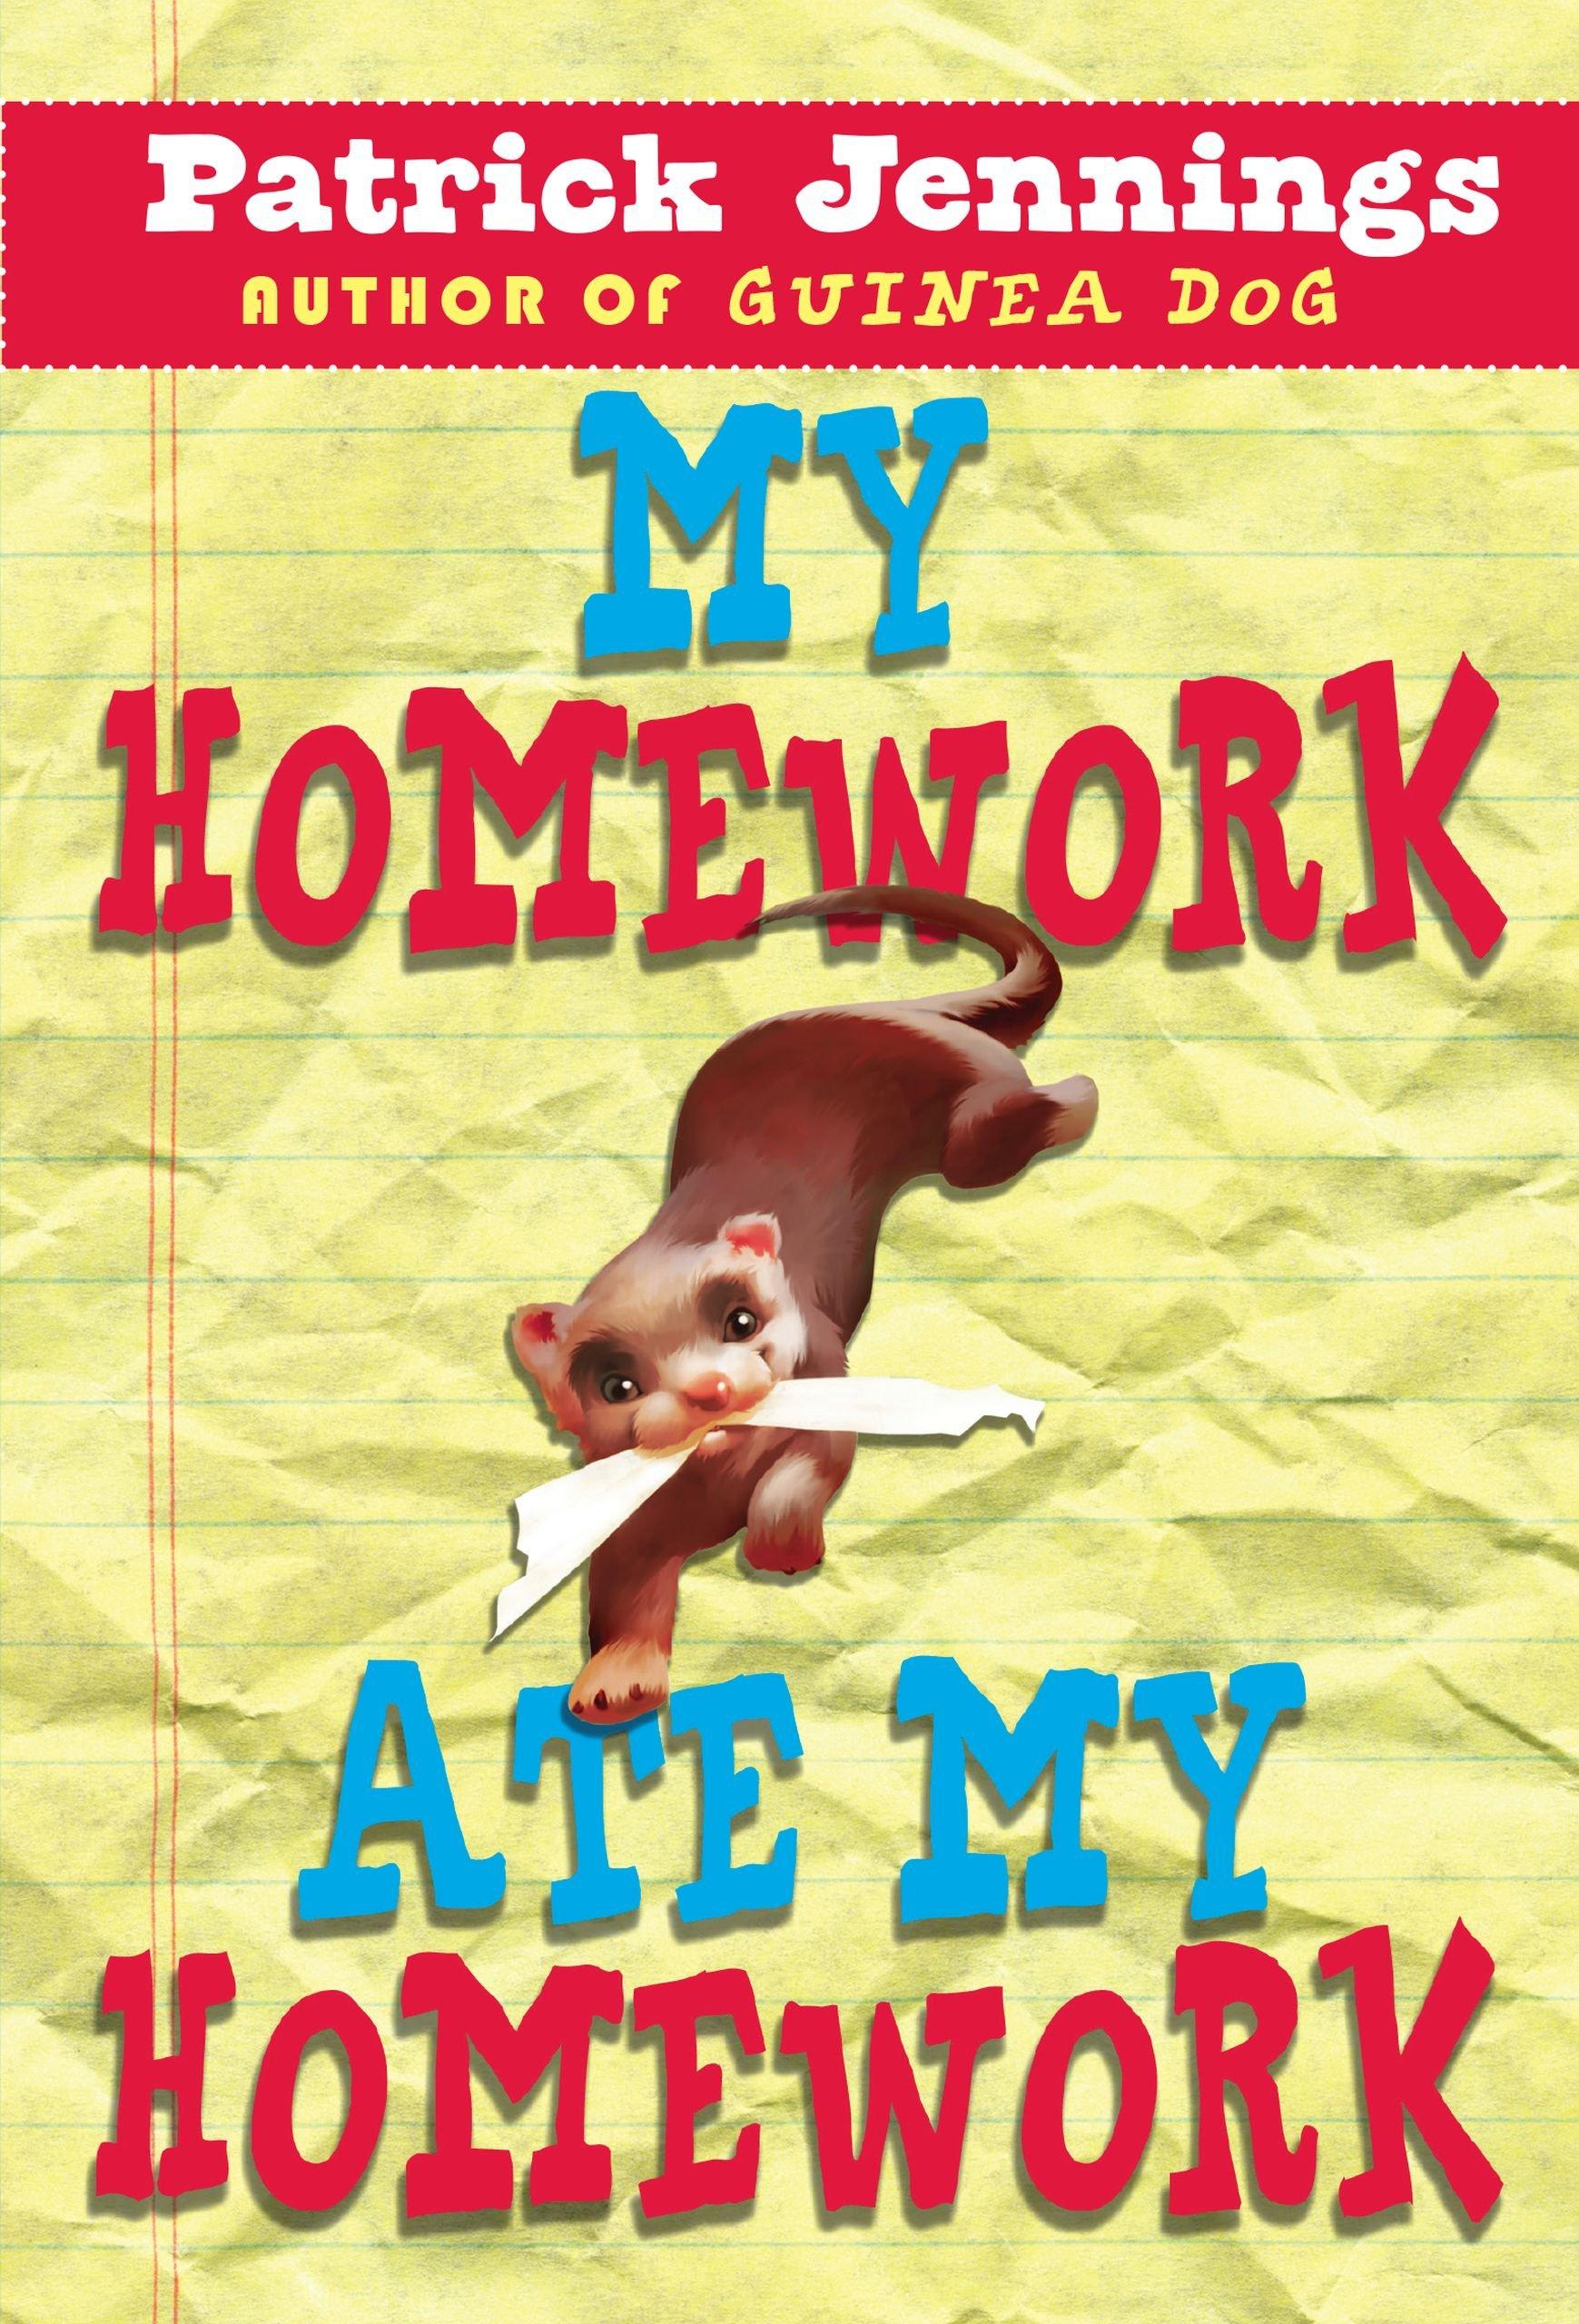 My Homework Ate My Homework: Patrick Jennings: 9781606845066: Amazon.com:  Books